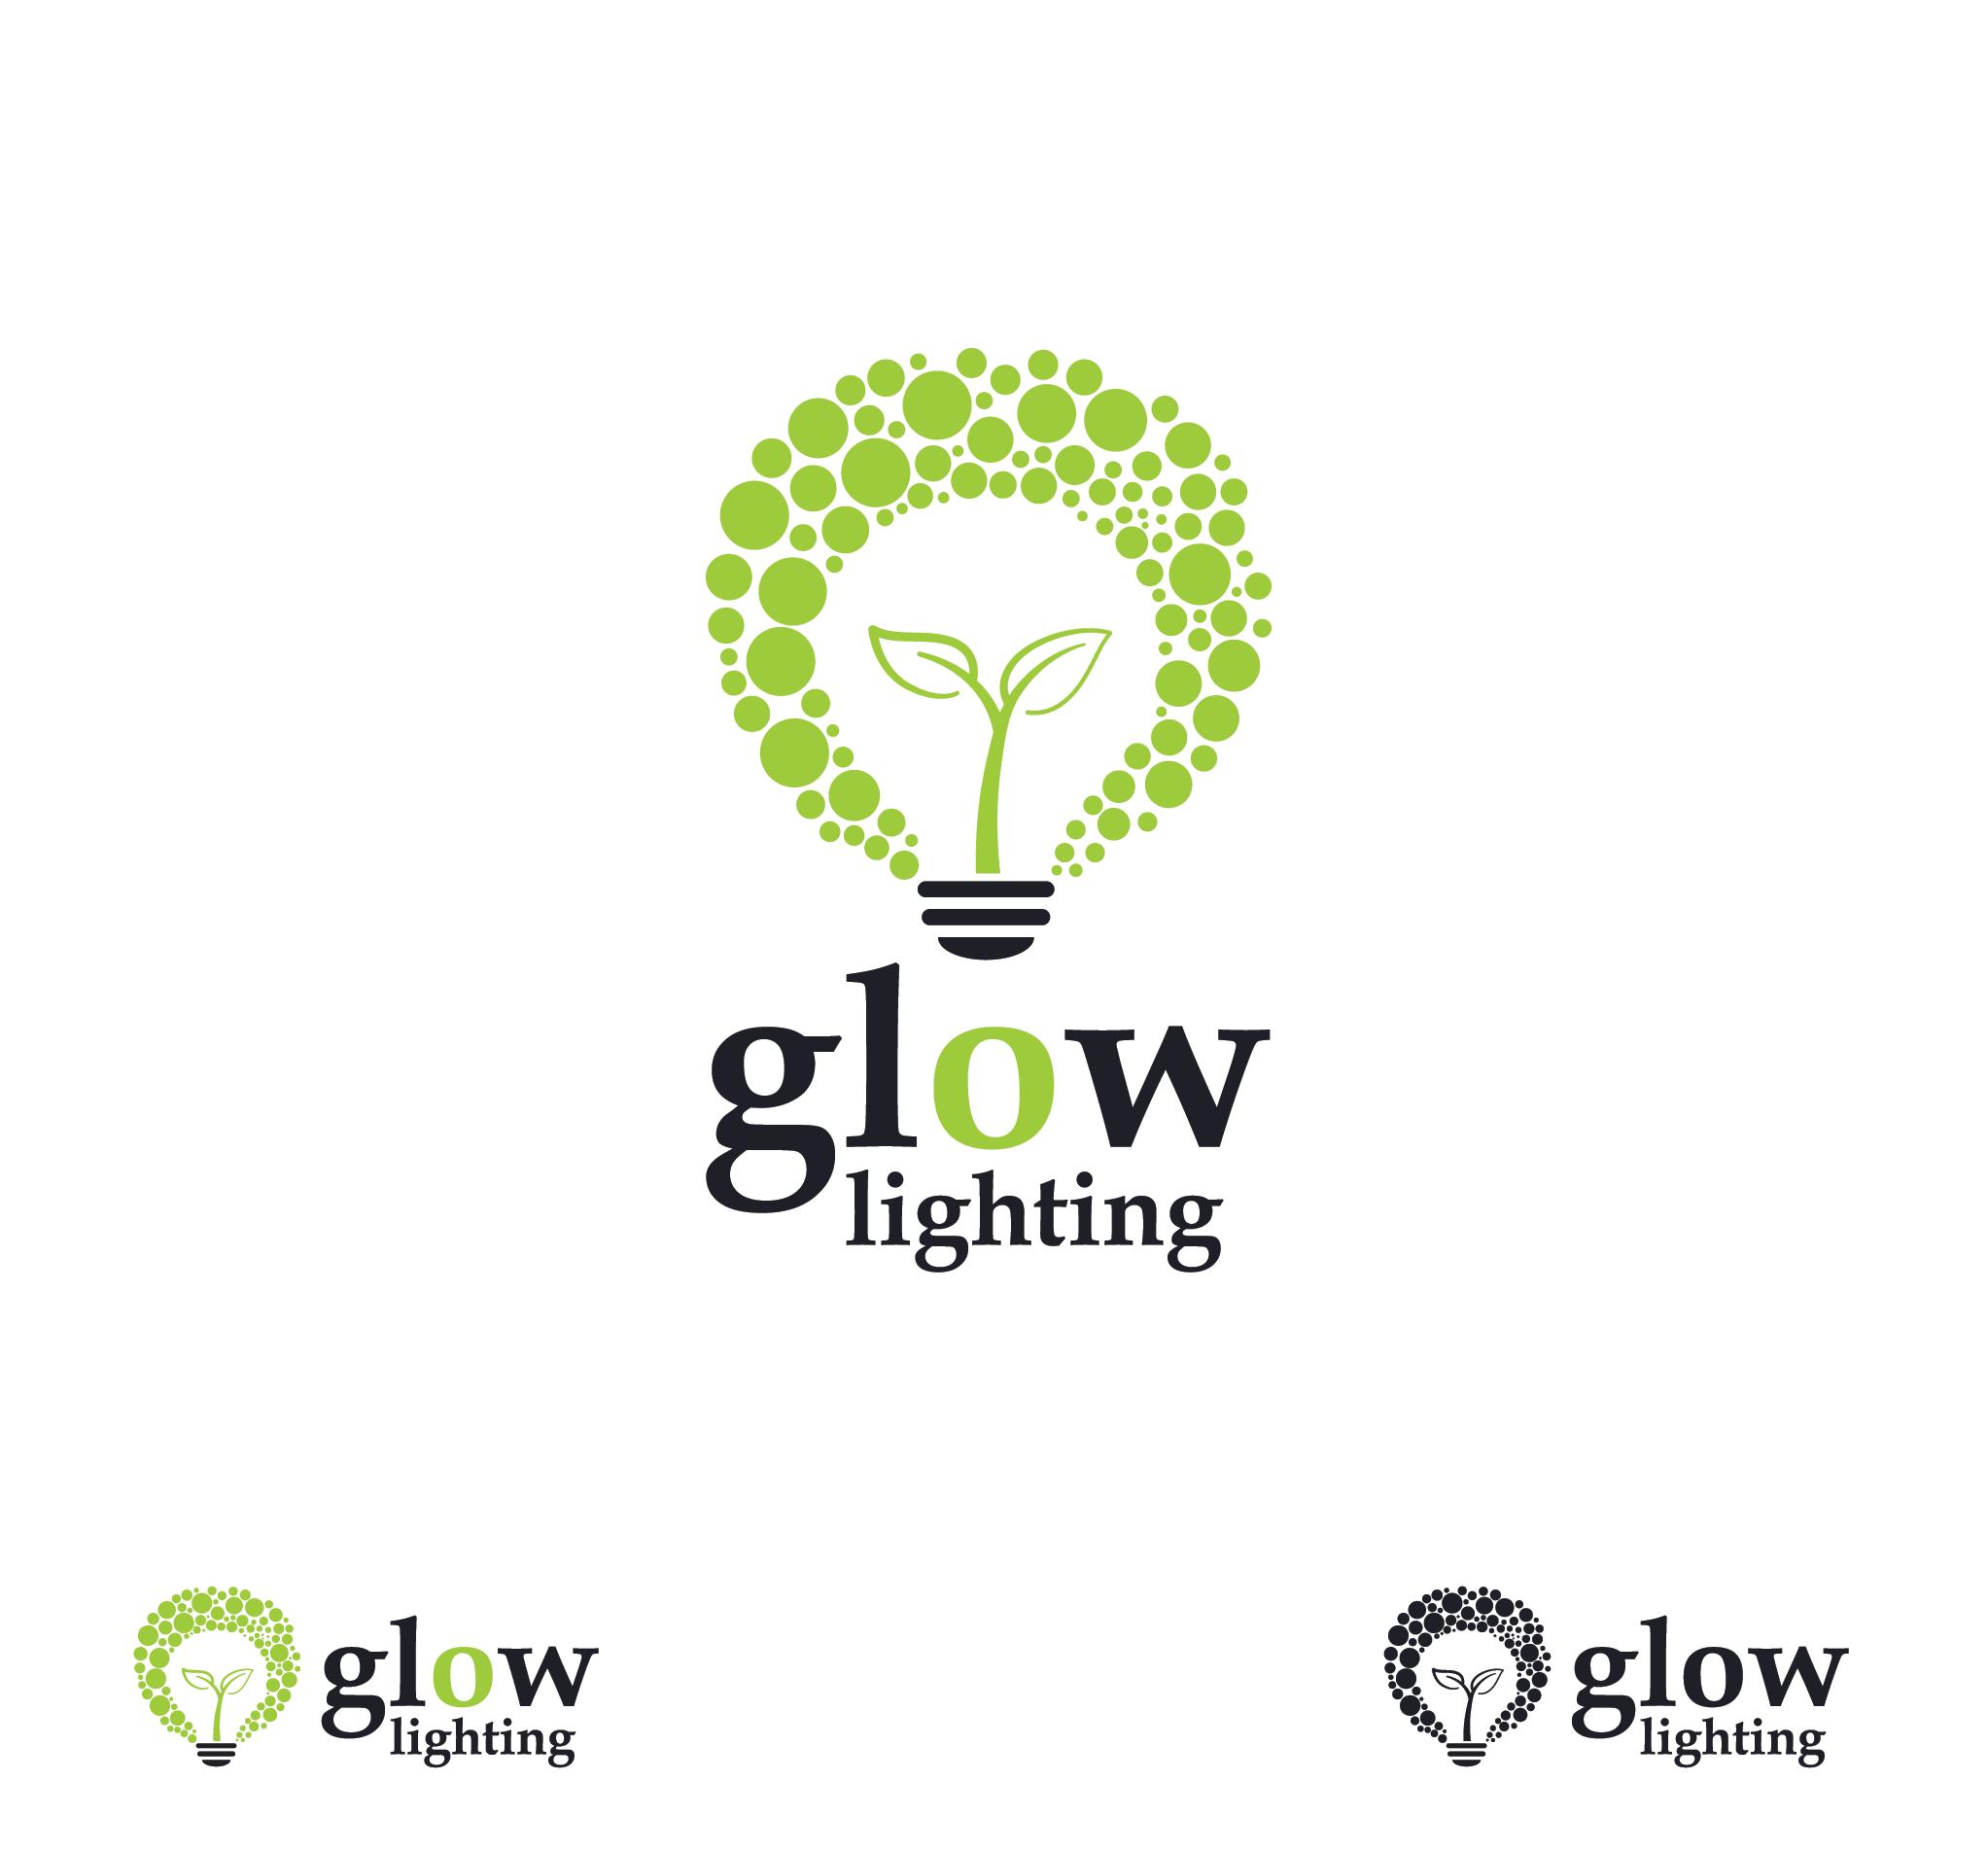 Create a memorable logo for Glow Lighting!